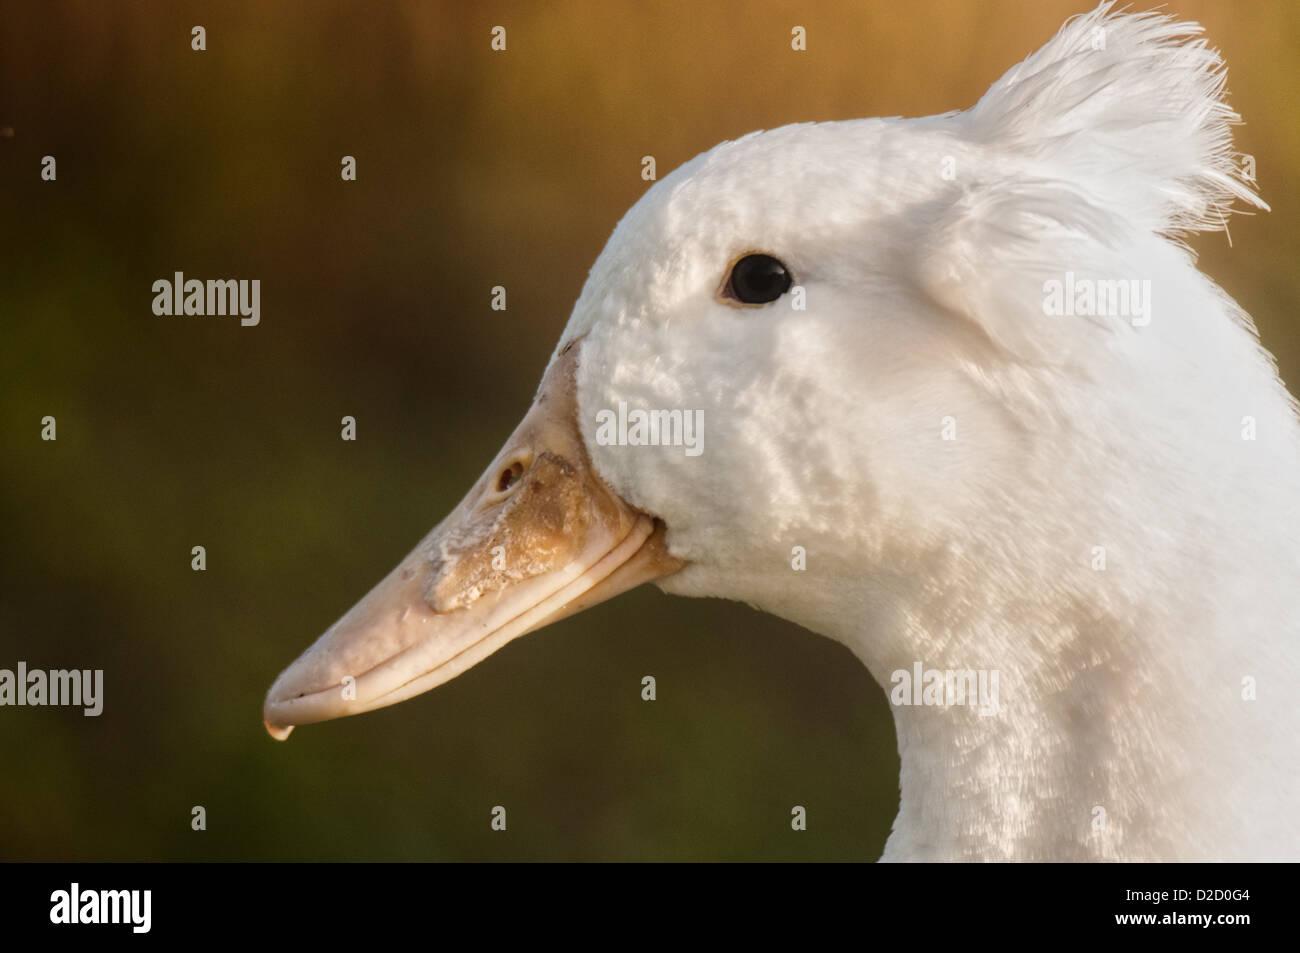 Crested White Duck at Lake Morton in Lakeland, Florida. - Stock Image